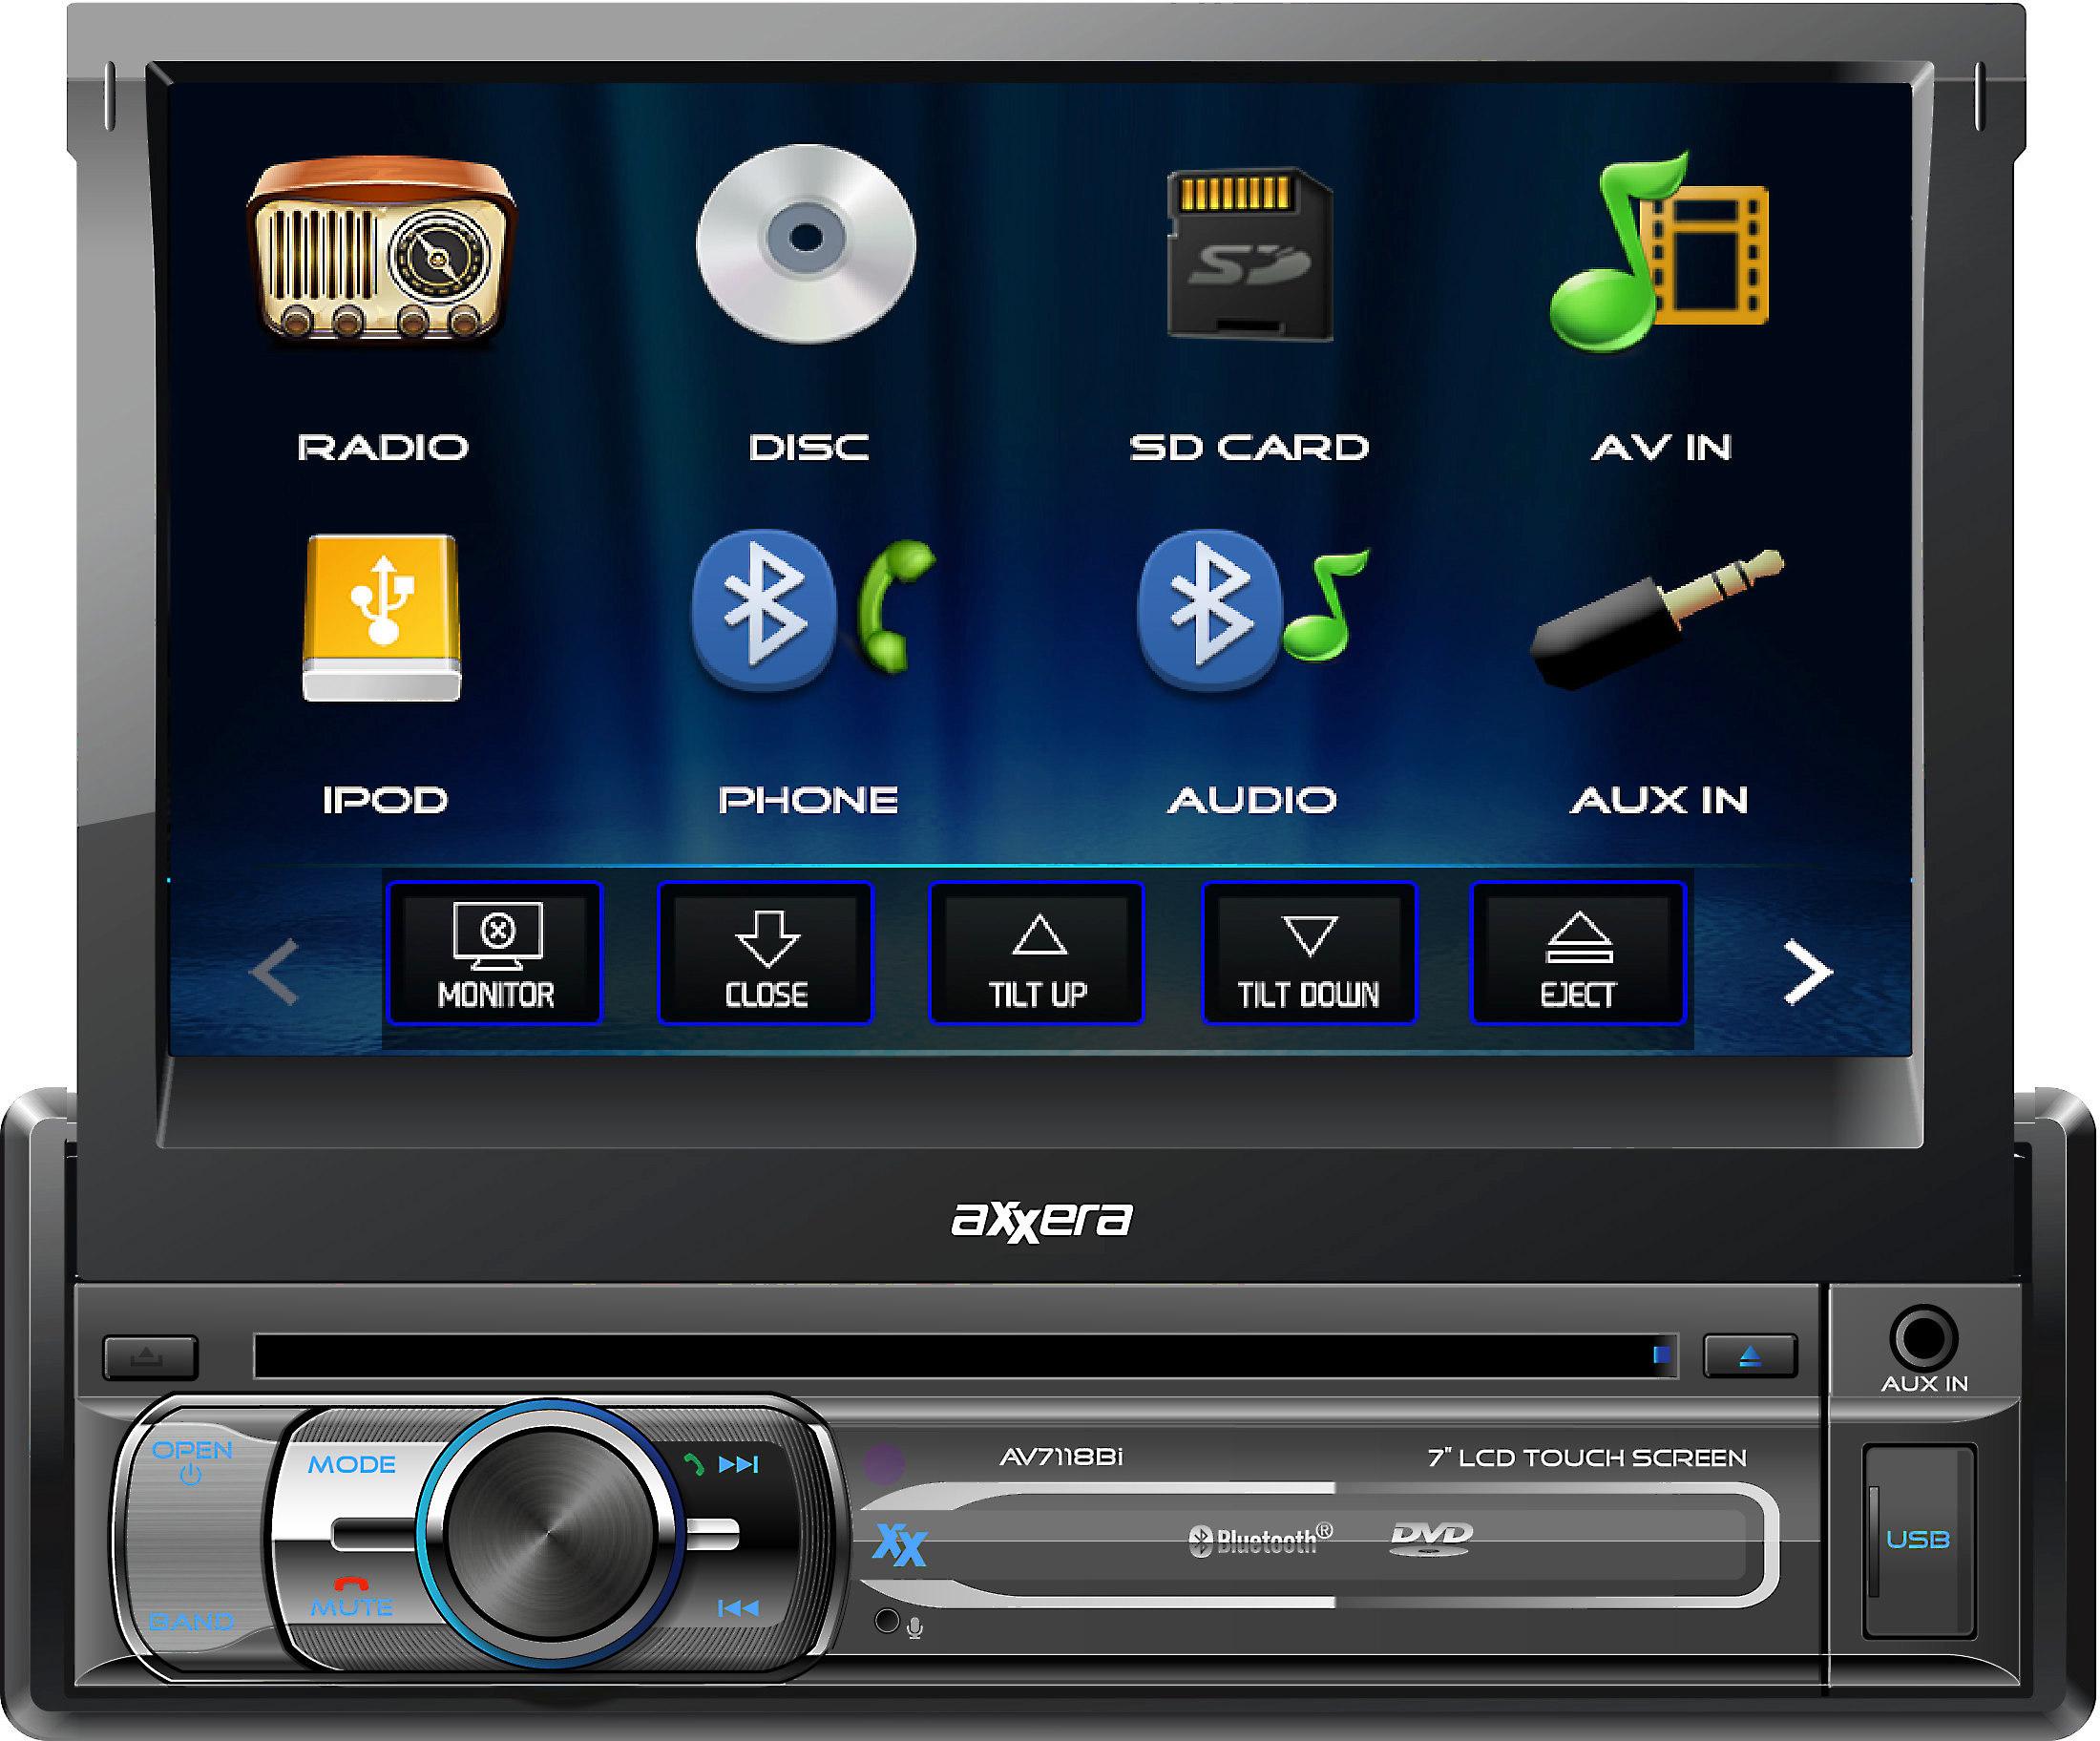 13f80ca1ee57 Axxera AV7118Bi DVD receiver at Crutchfield.com